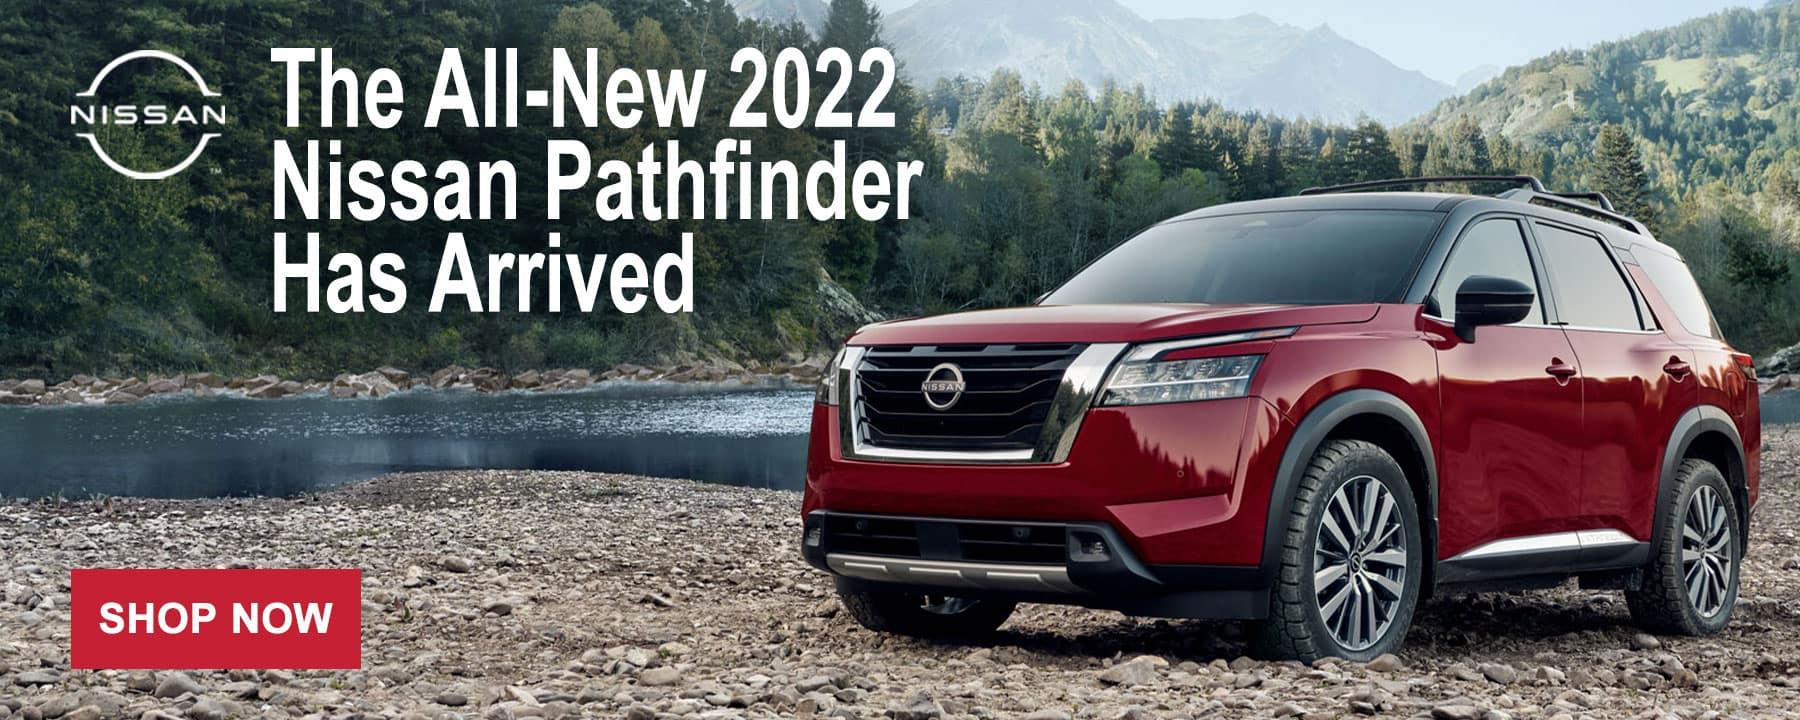 2022-Pathfinder-Has-Arrived